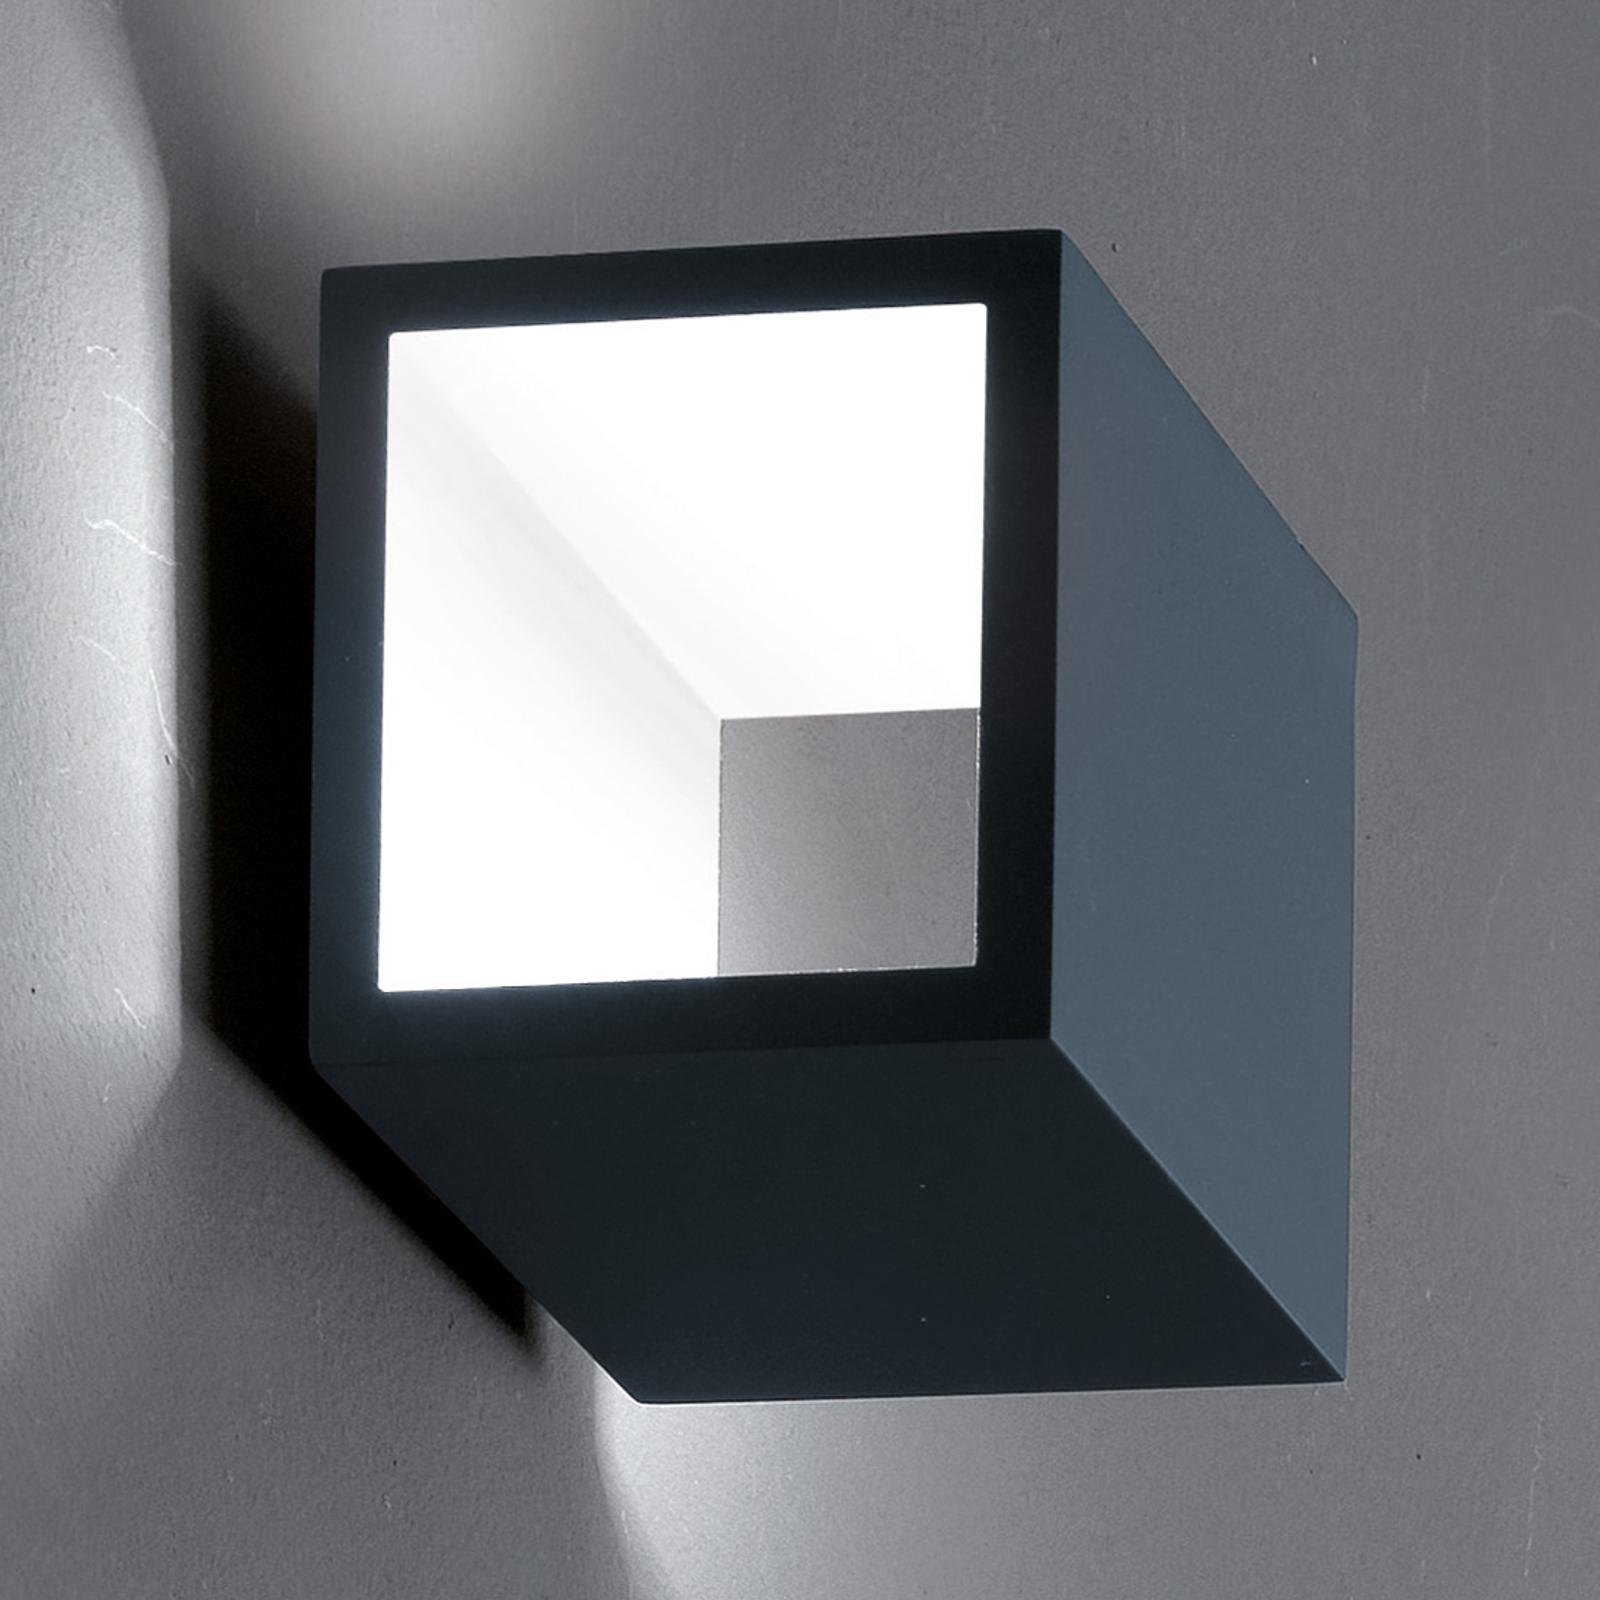 ICONE Cubò LED plafondlamp, 10 W, titanium/wit